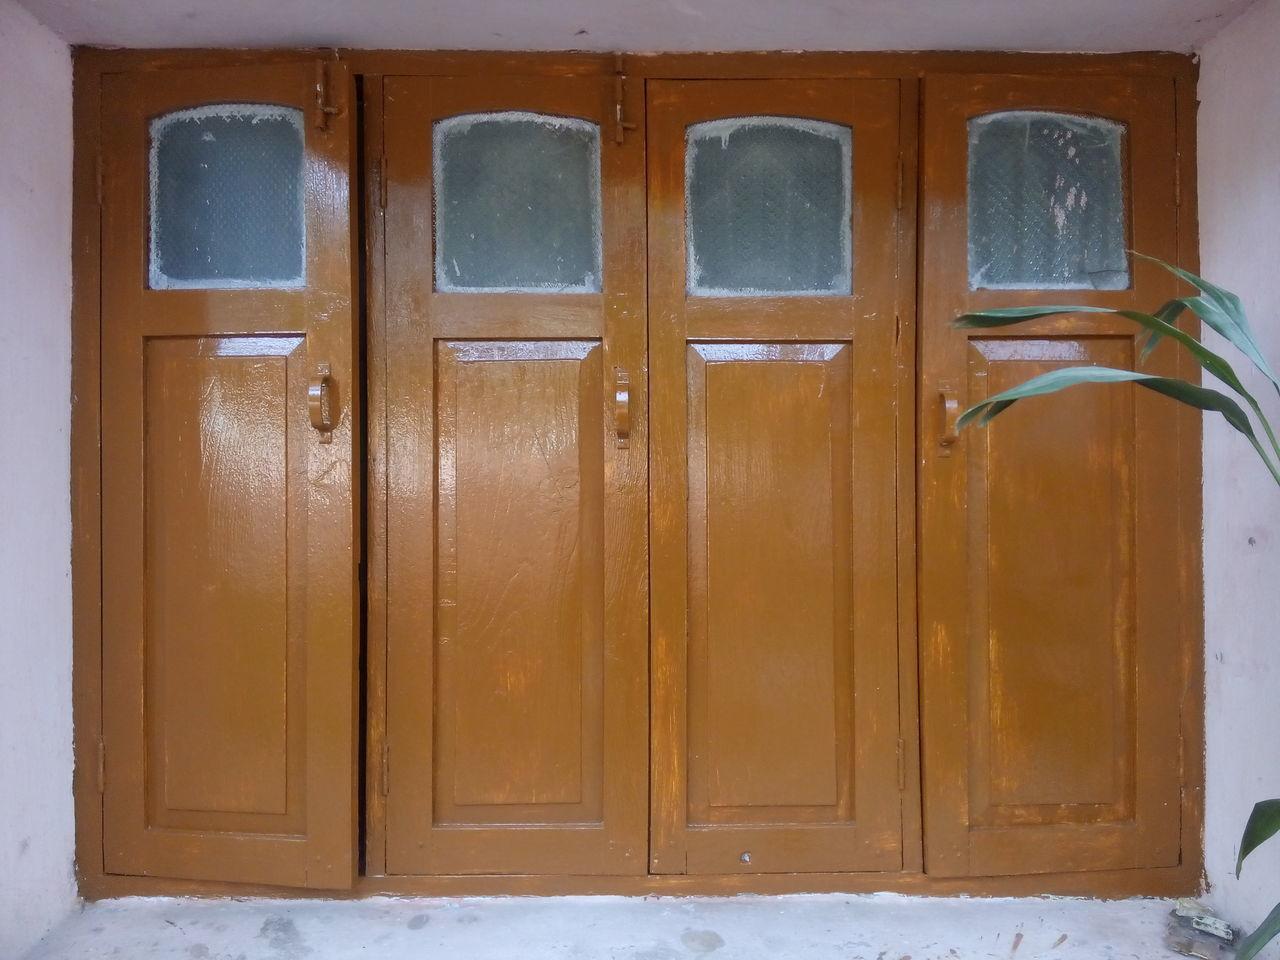 Closed Door Window Close-up No People Building Exterior Outdoors Day Architecture Sliding Door